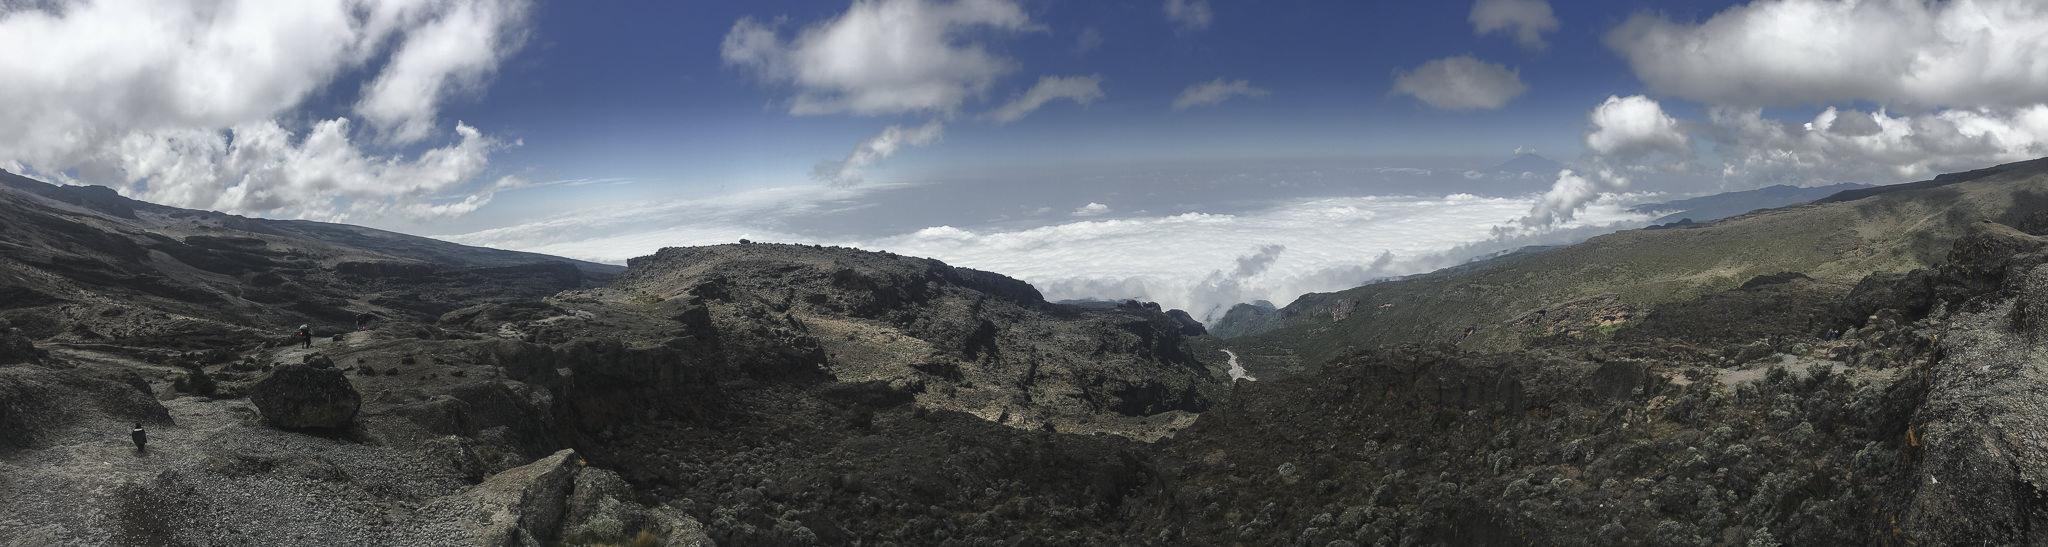 Kilimanjaro - 151